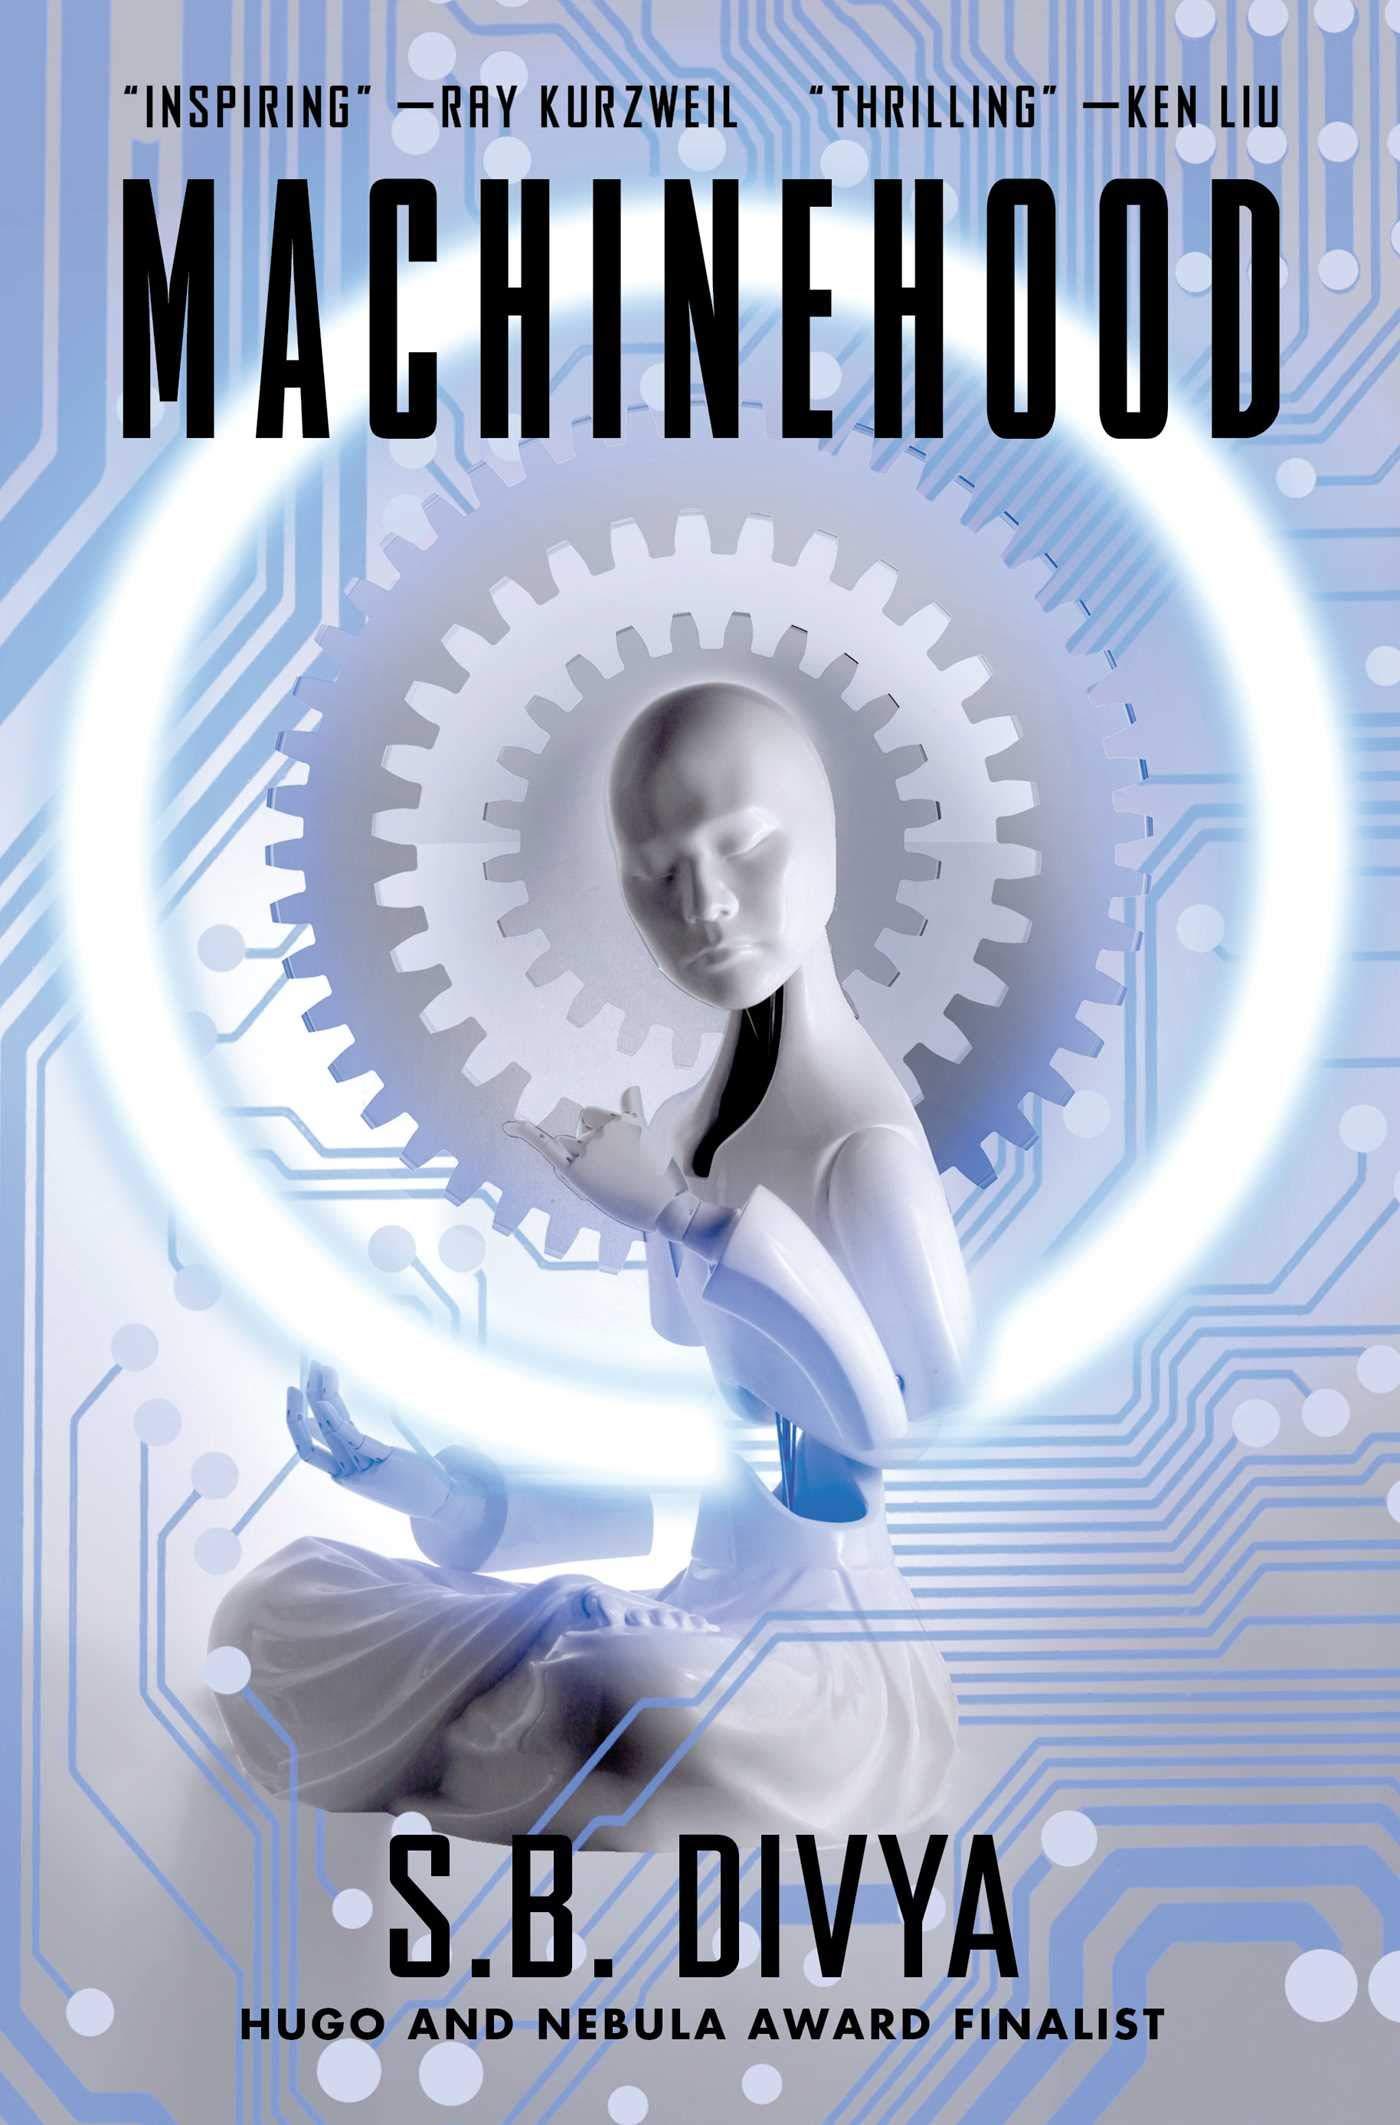 Machinehood by S.B. Divya